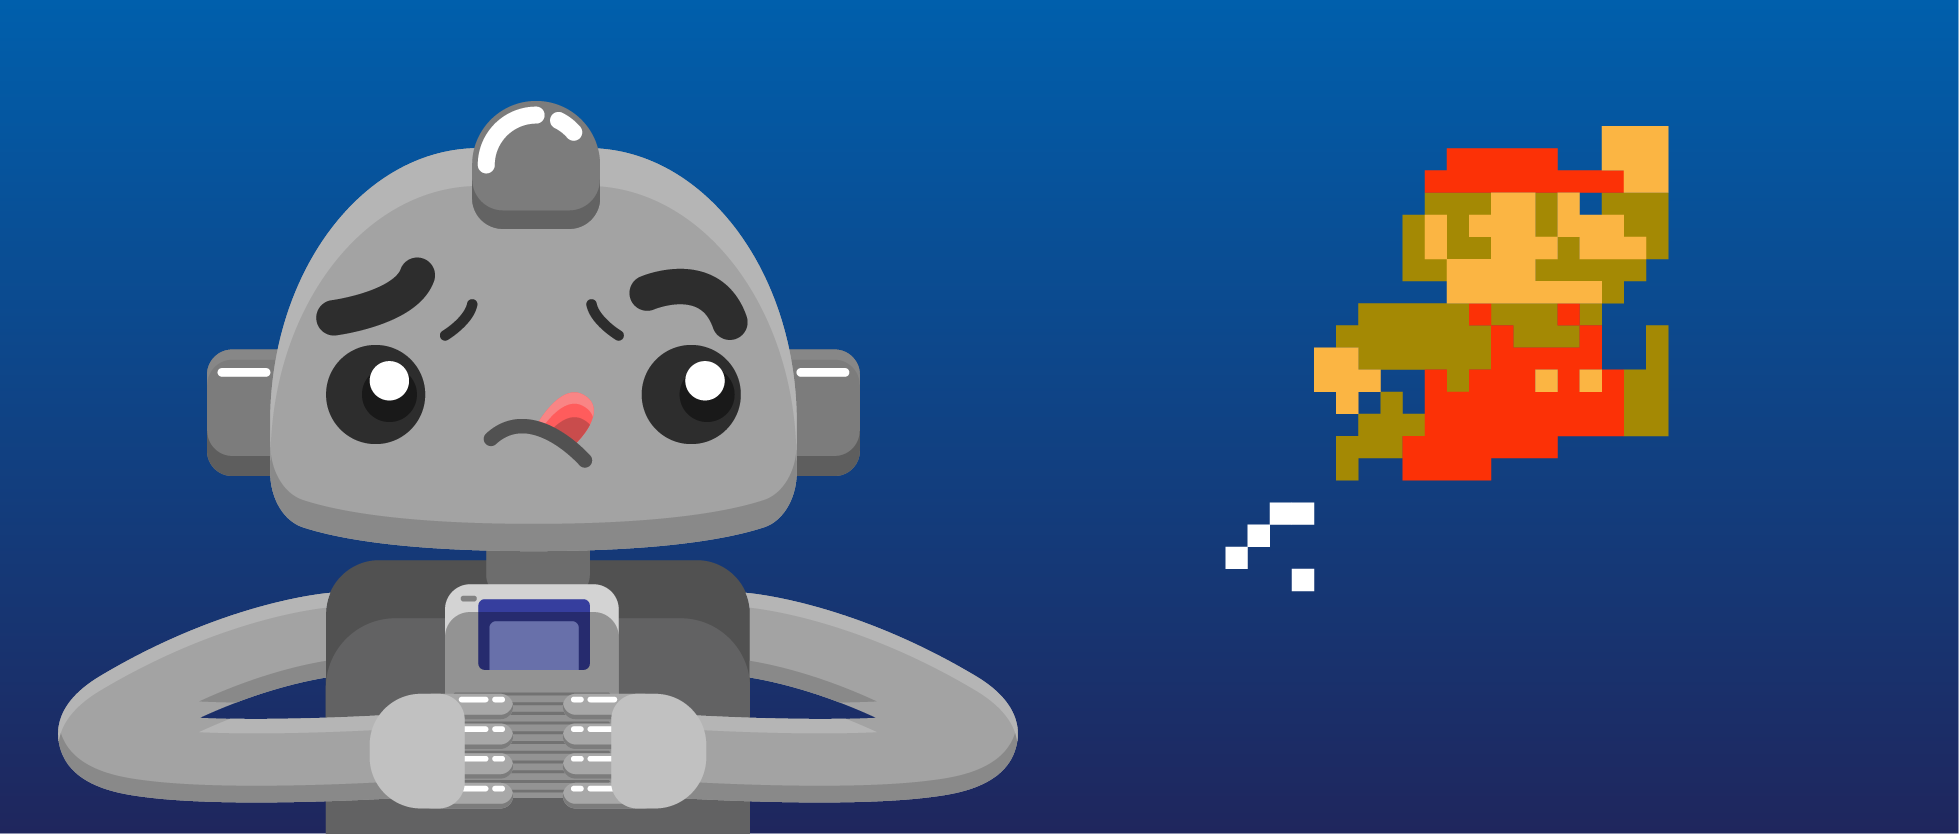 Mari O Aprende A Jugar A Super Mario Bros Con Inteligencia Artificial